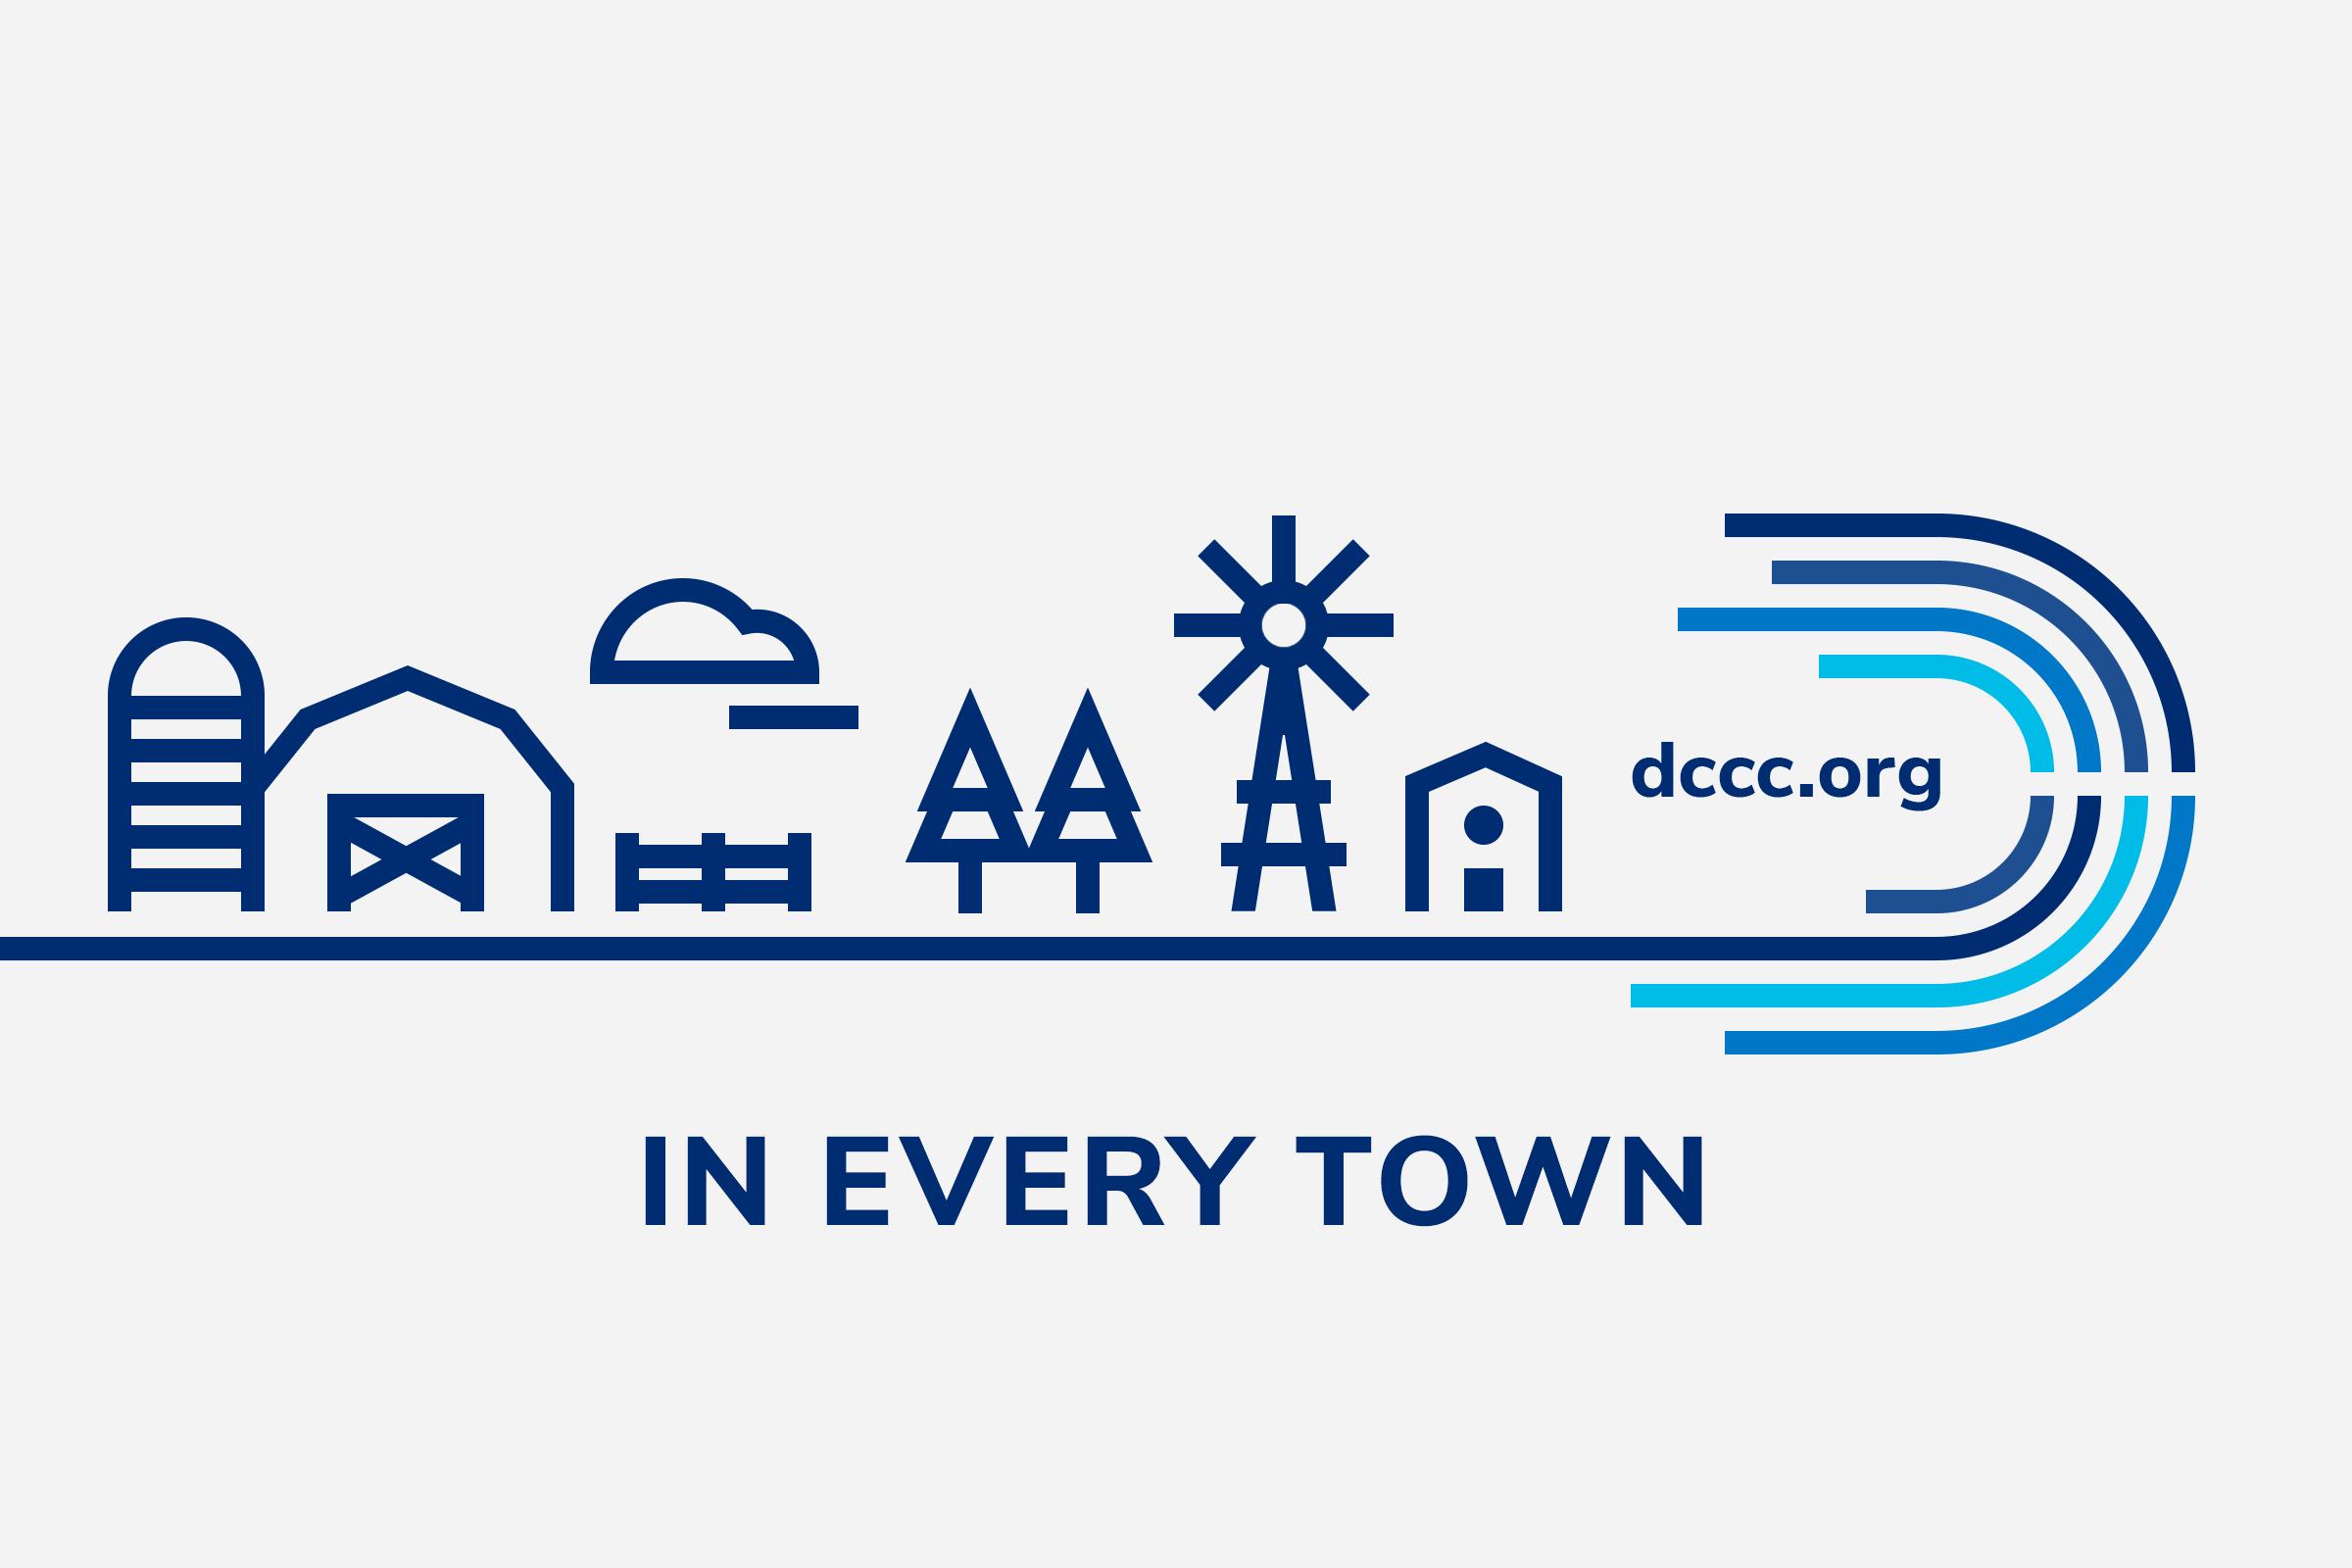 jkdc_dccc-vector-town.png